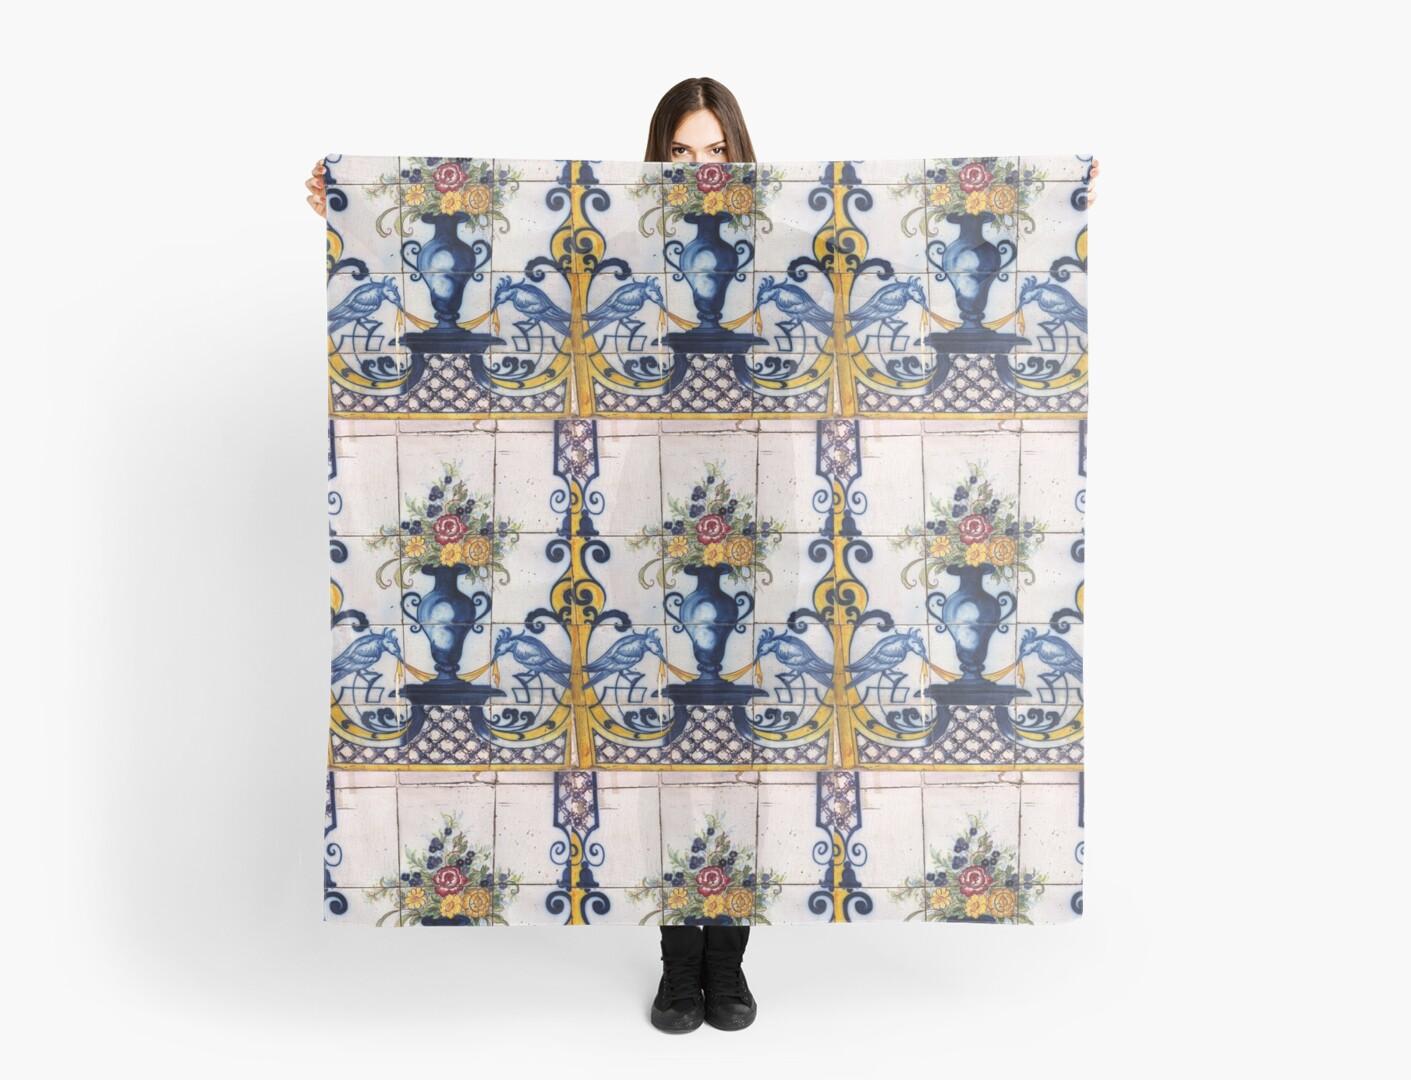 Portugal Tile Number Twenty One by Michael Kienhuis